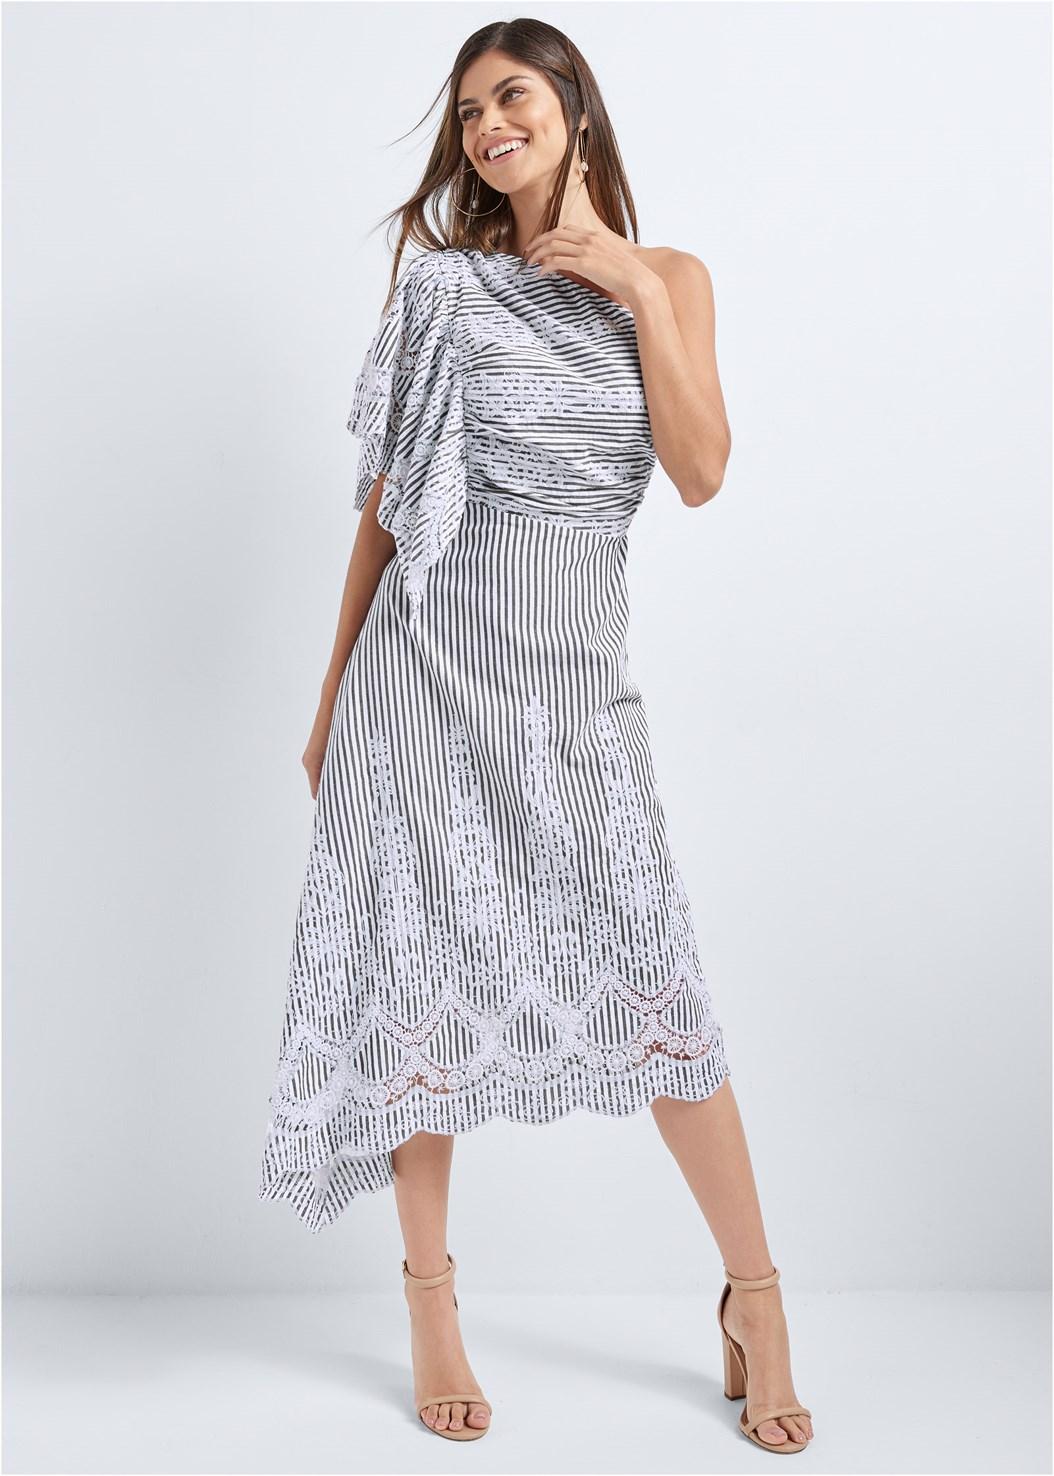 Embroidered Linen Dress,Block Heels